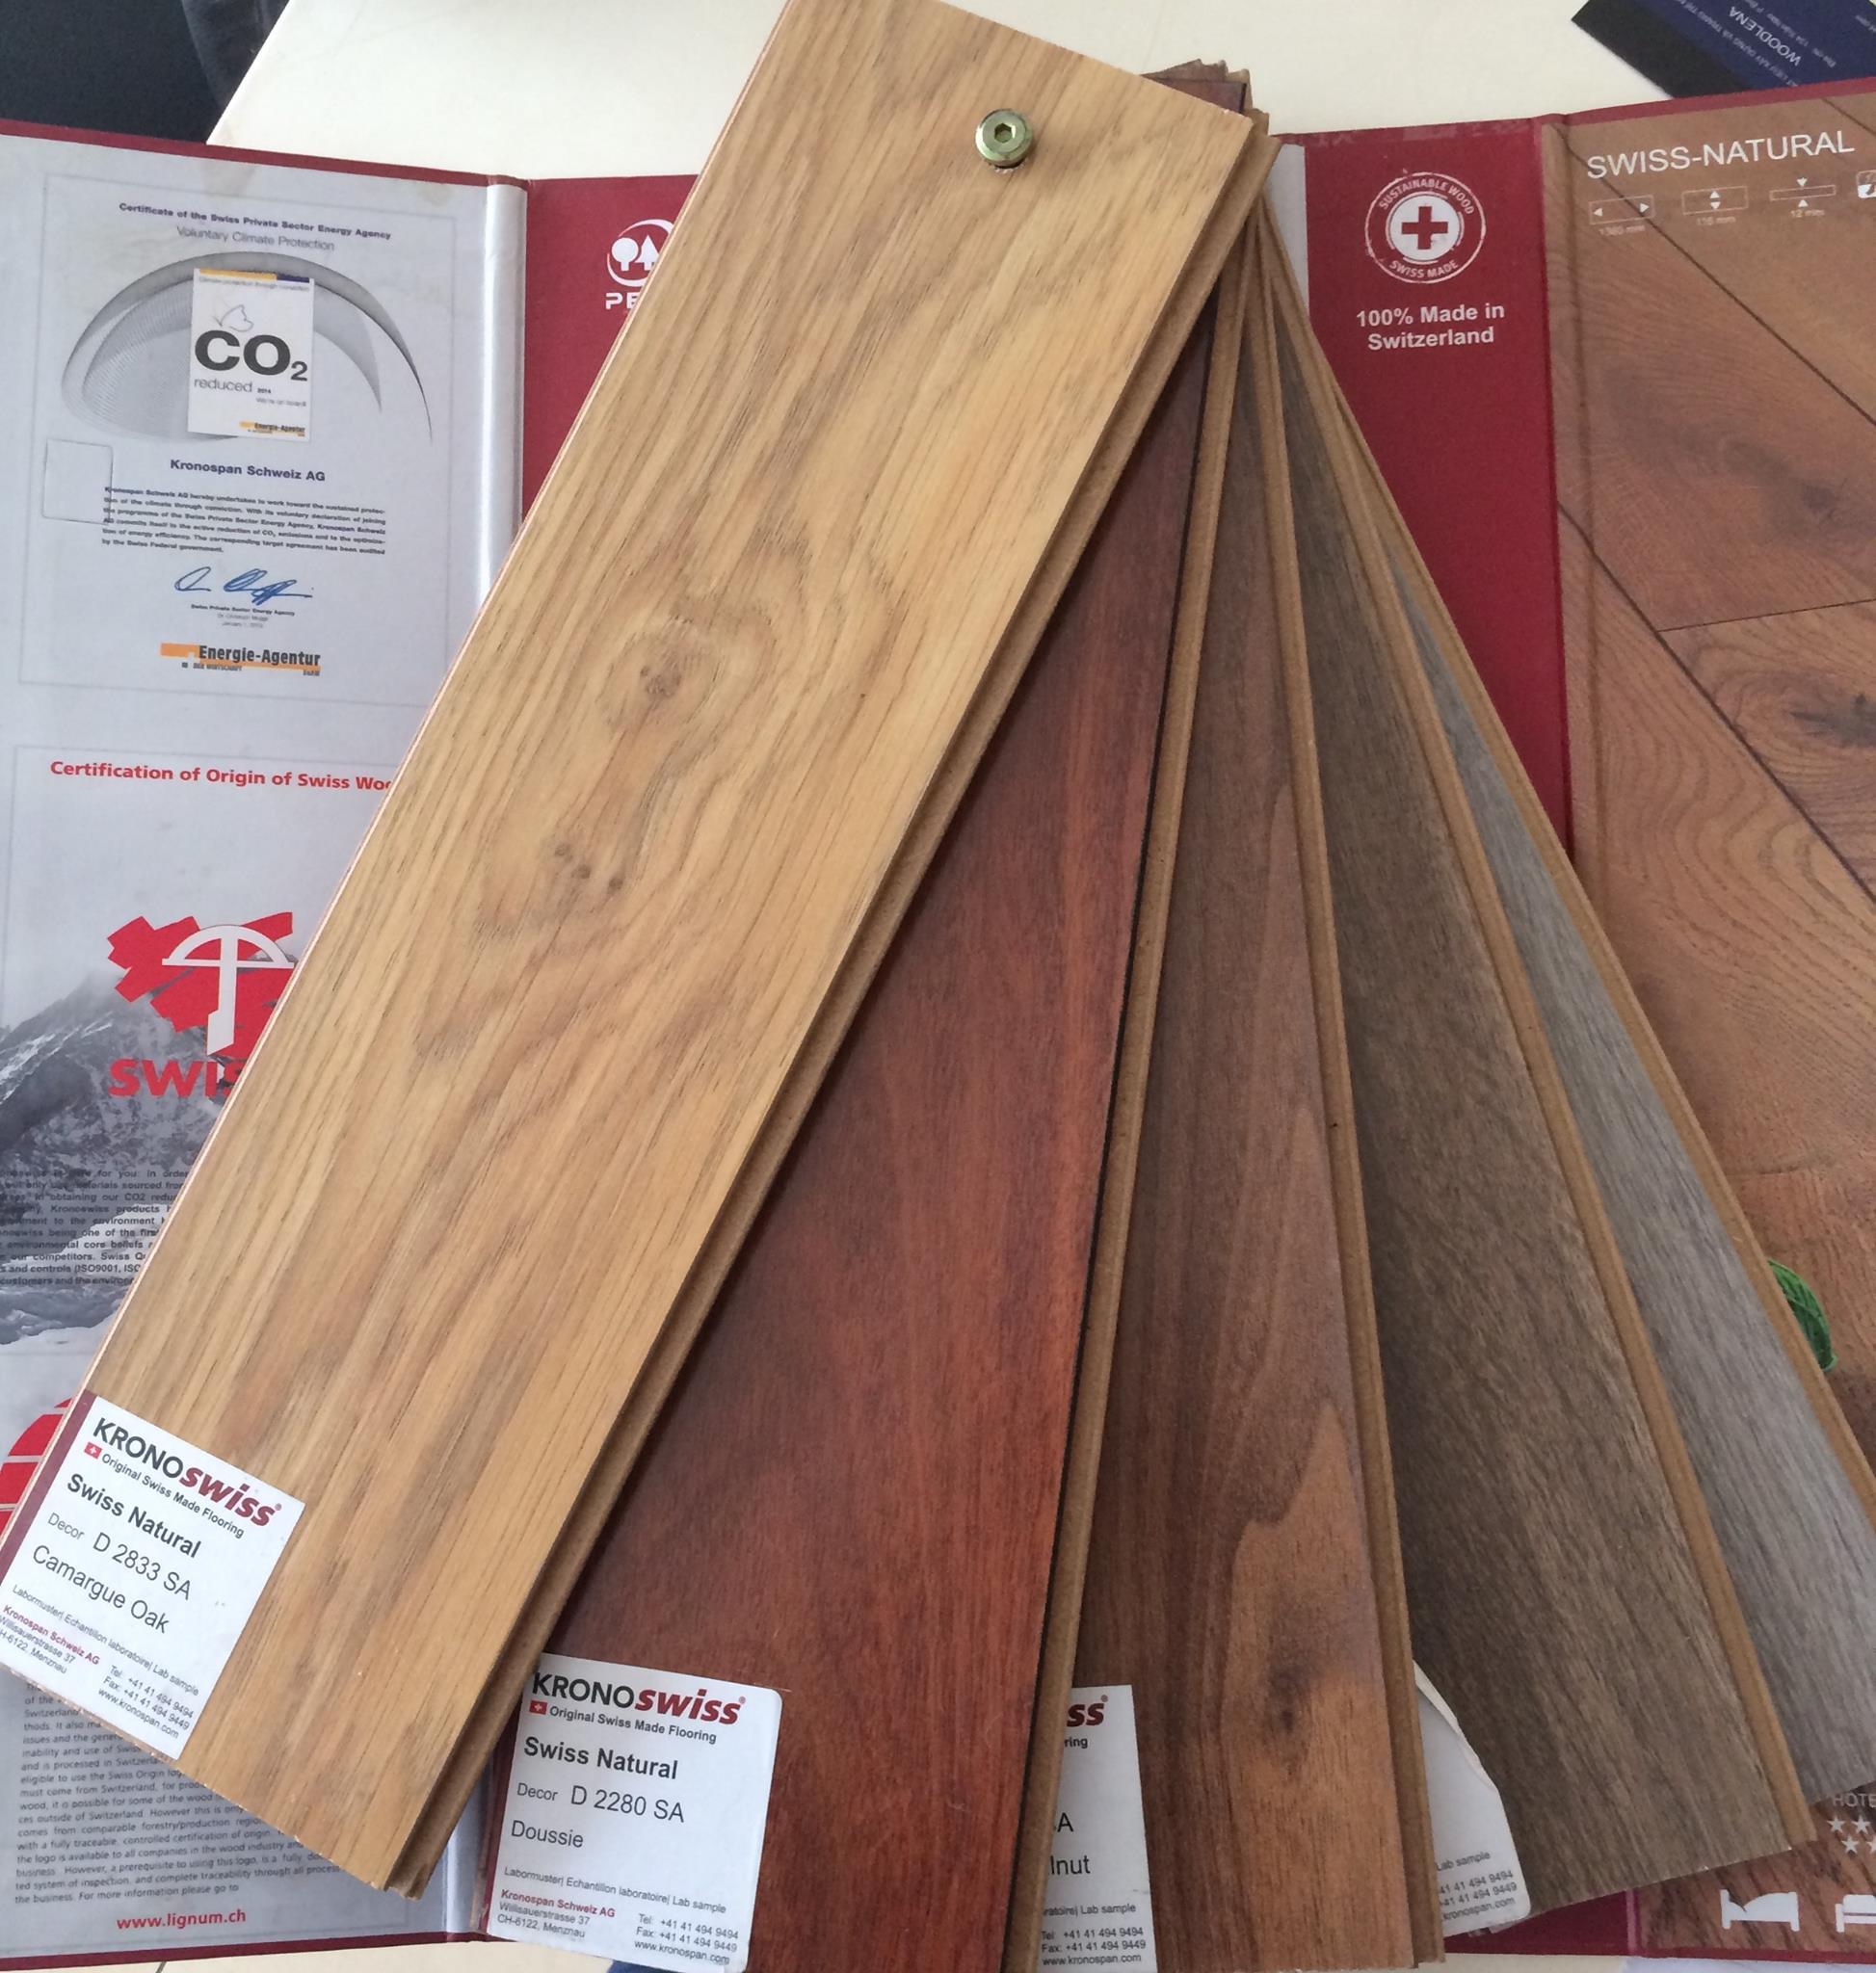 sàn gỗ kronoswiss loại sàn gỗ cao cấp